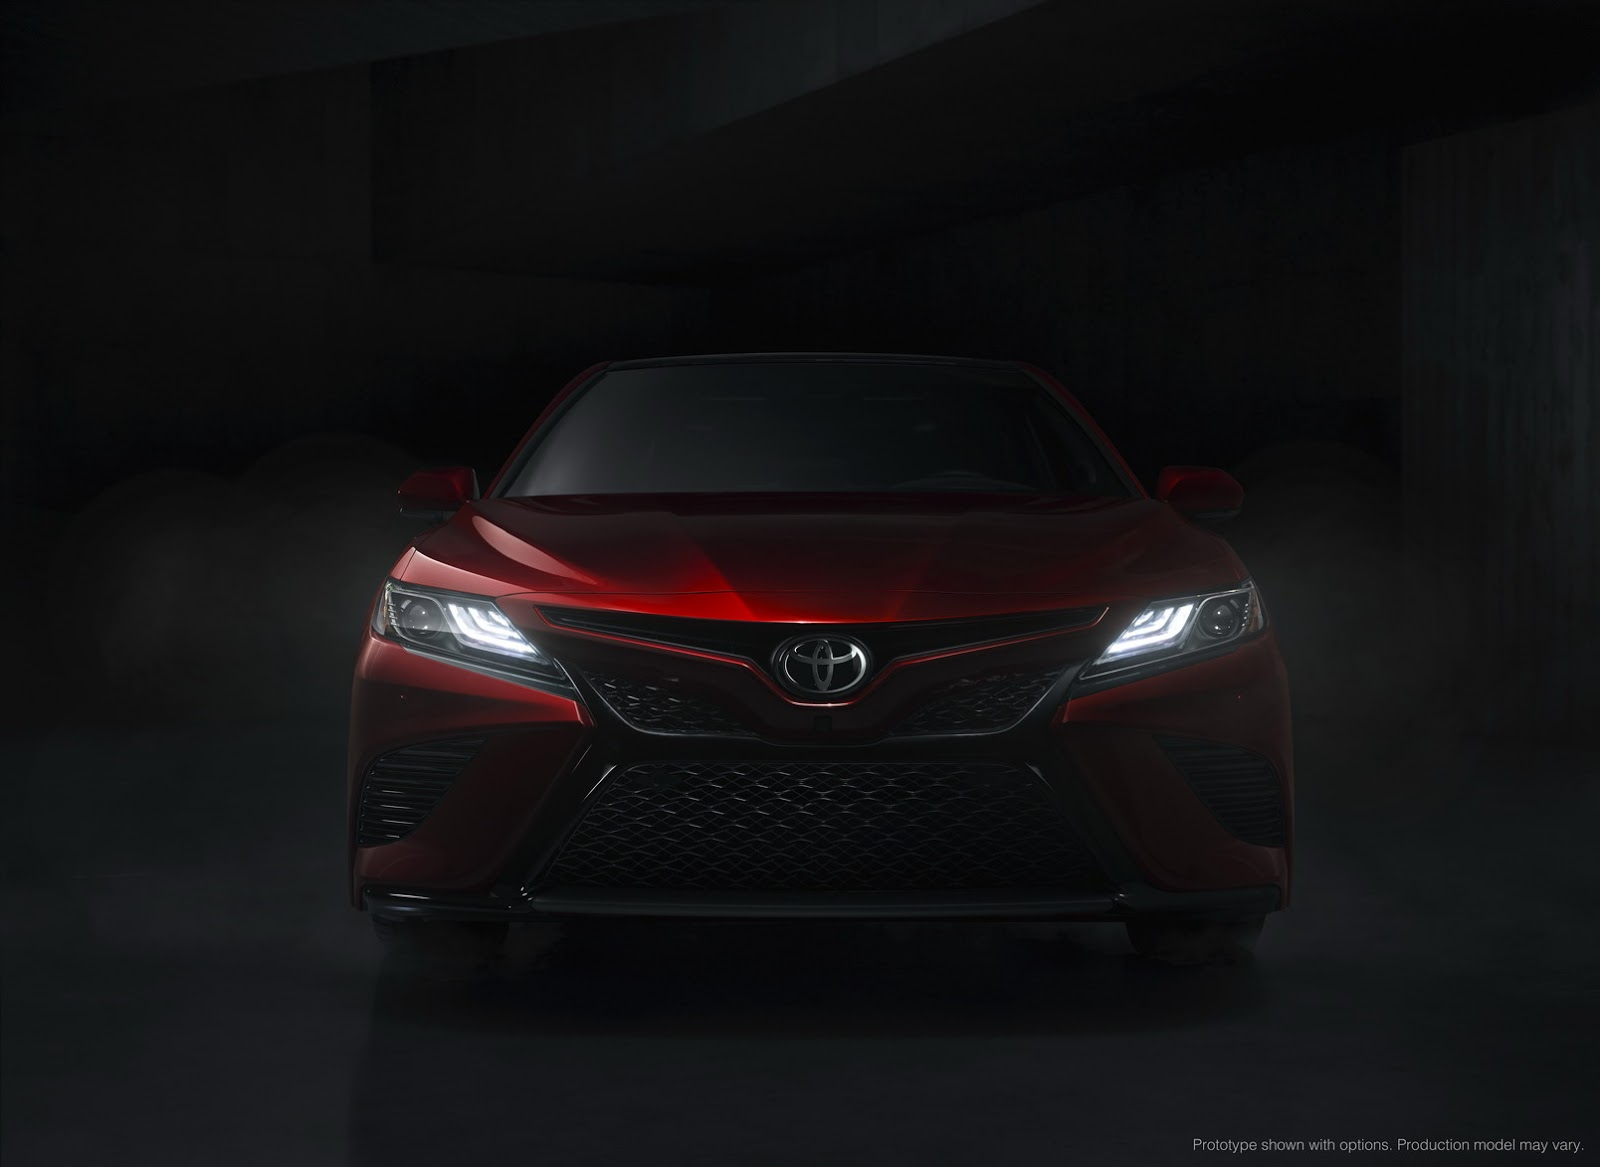 Toyota-Camry-2018 (5)